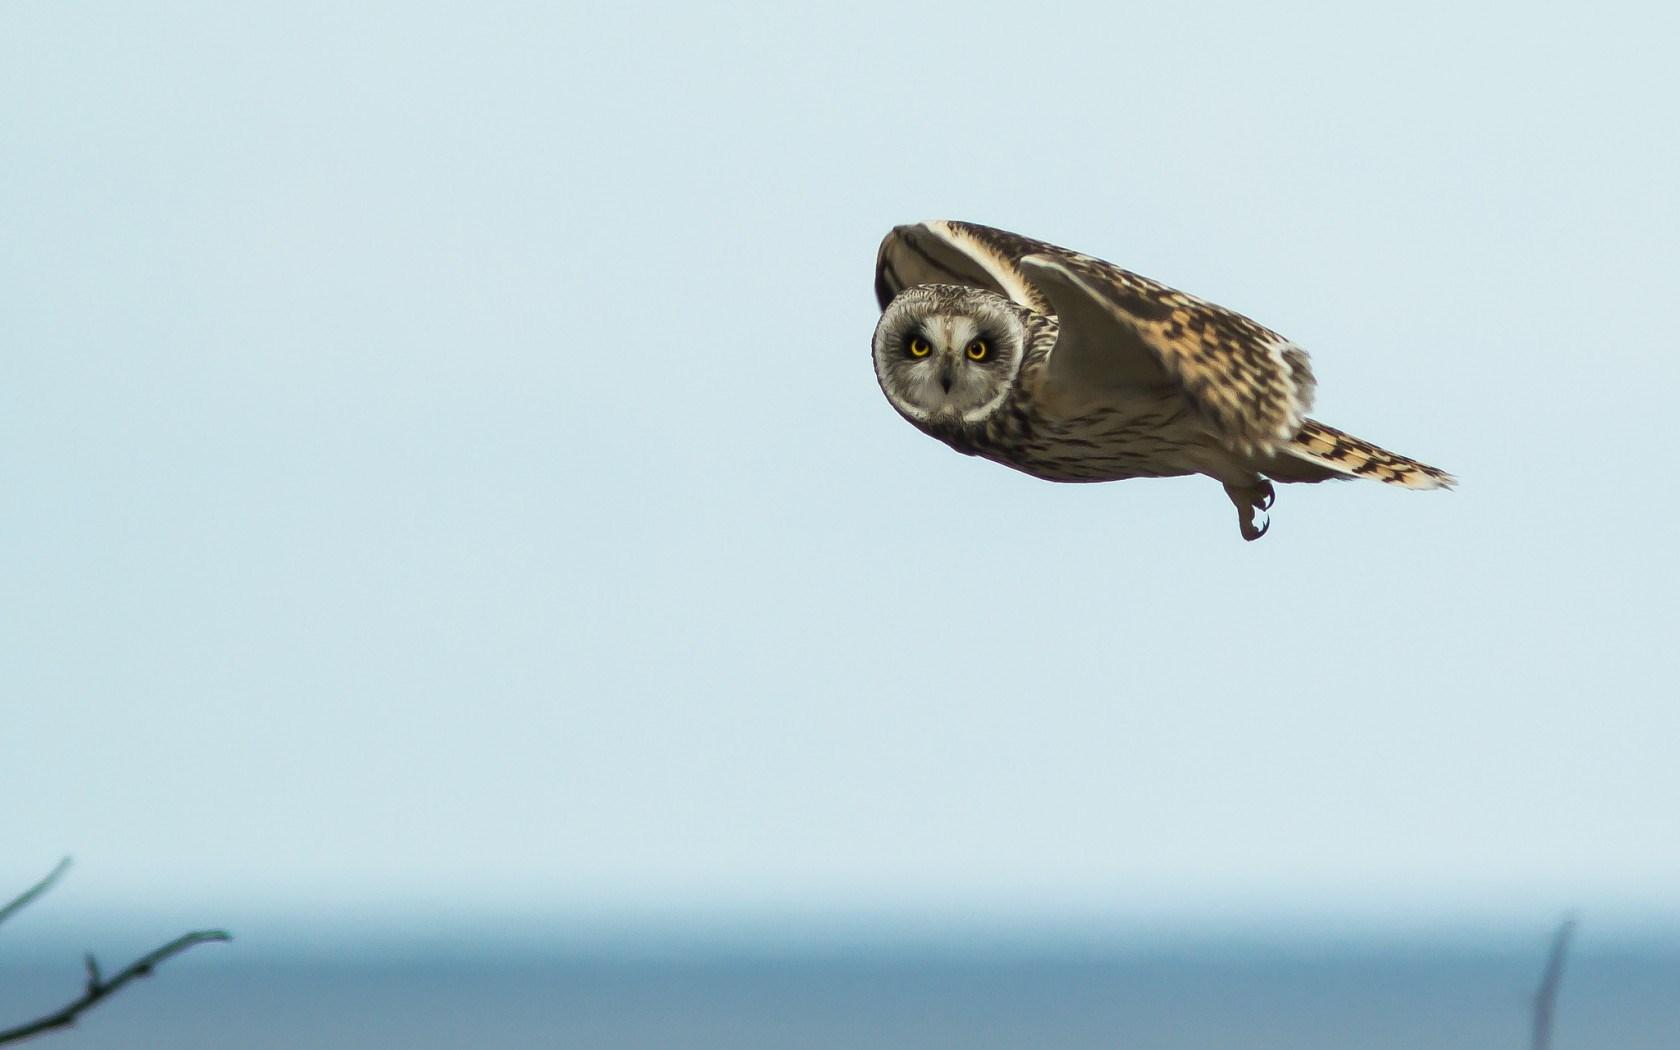 Sky Bird Owl Flying 1680x1050